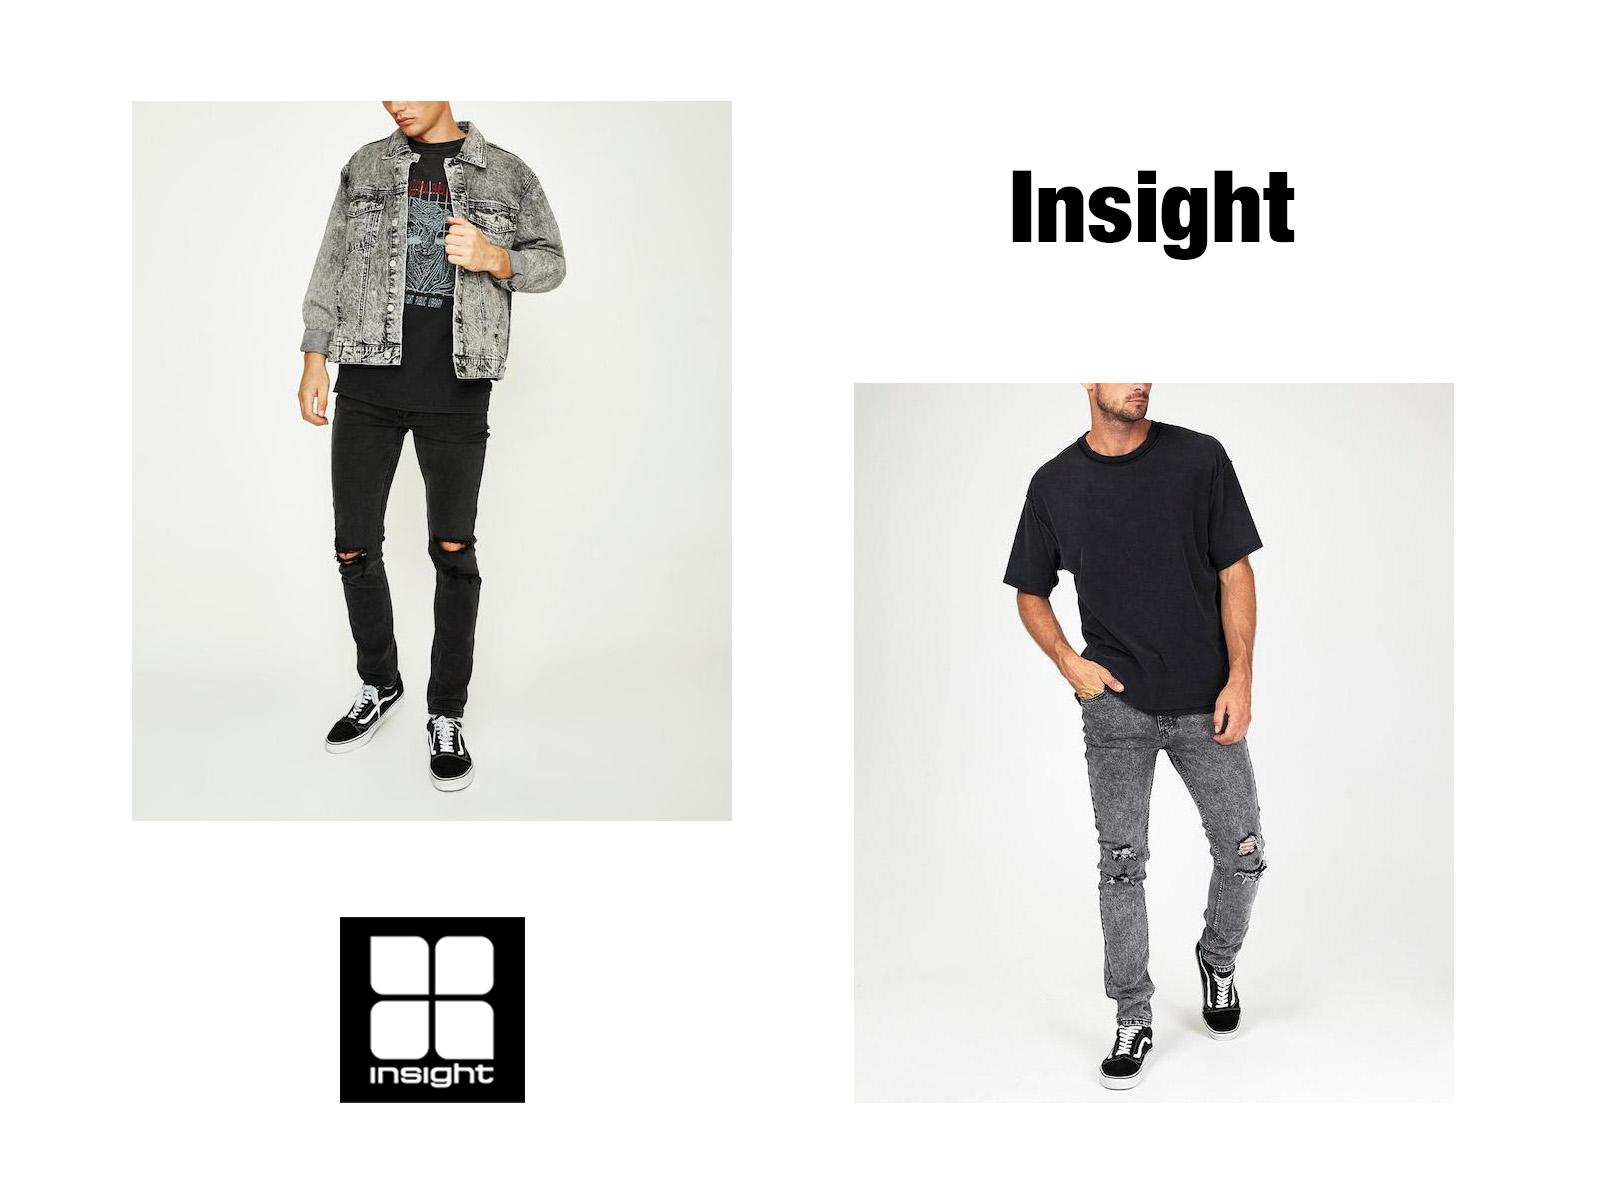 NEW ARRIVALS – INSIGHT AUTUMN/WINTER 2017